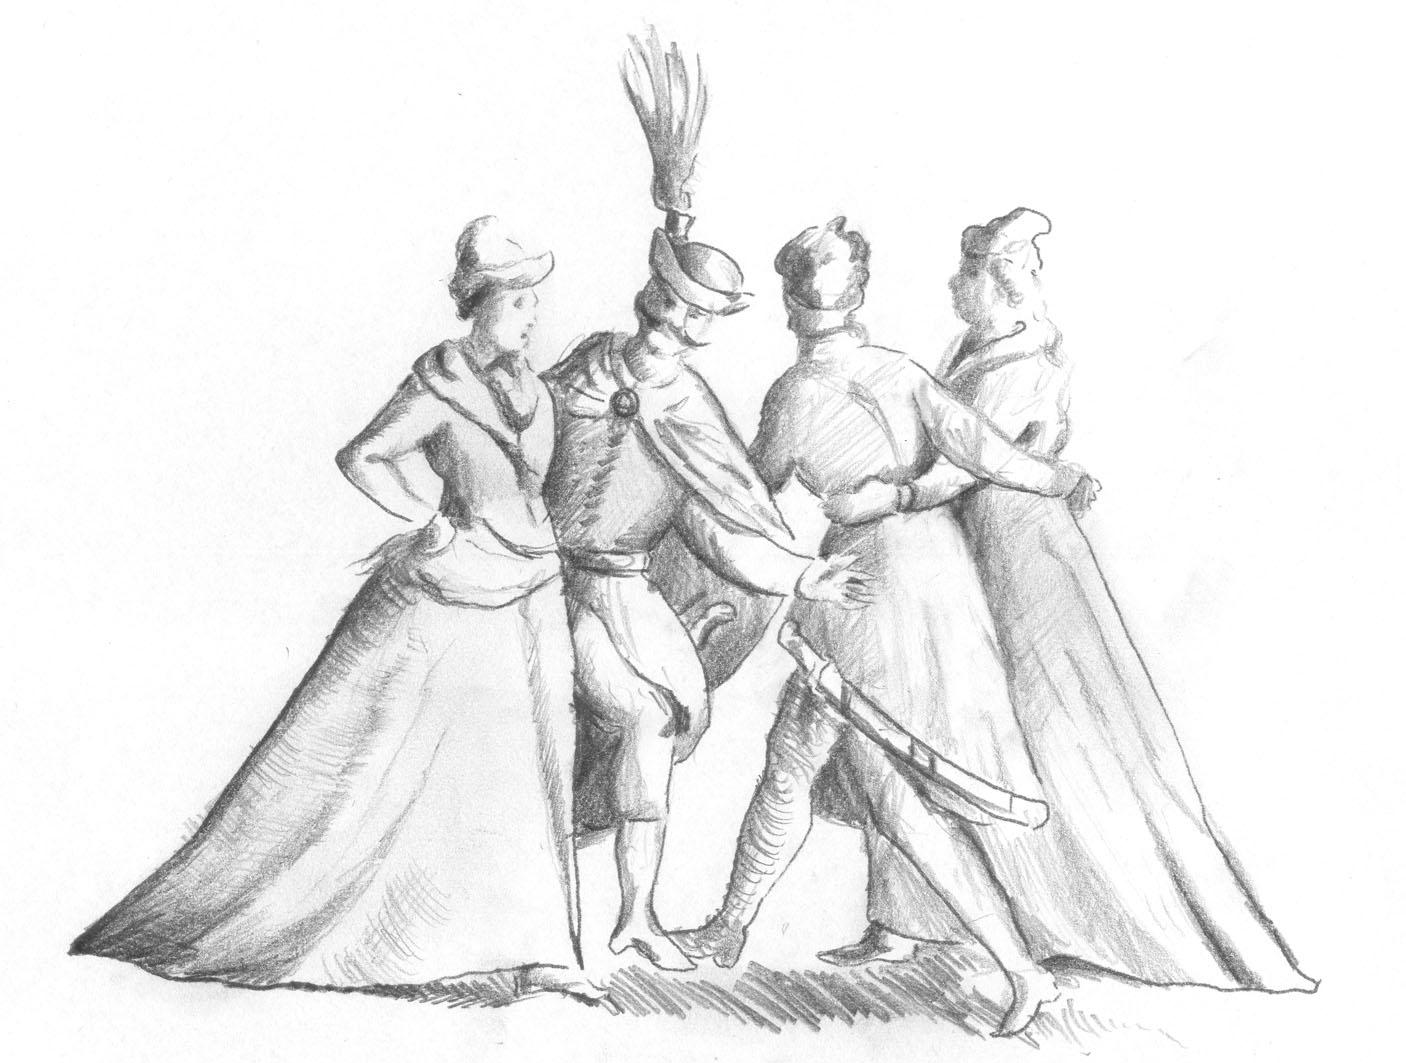 tance_polskie_pod_smolenskiem_wg_dollabelli.jpg